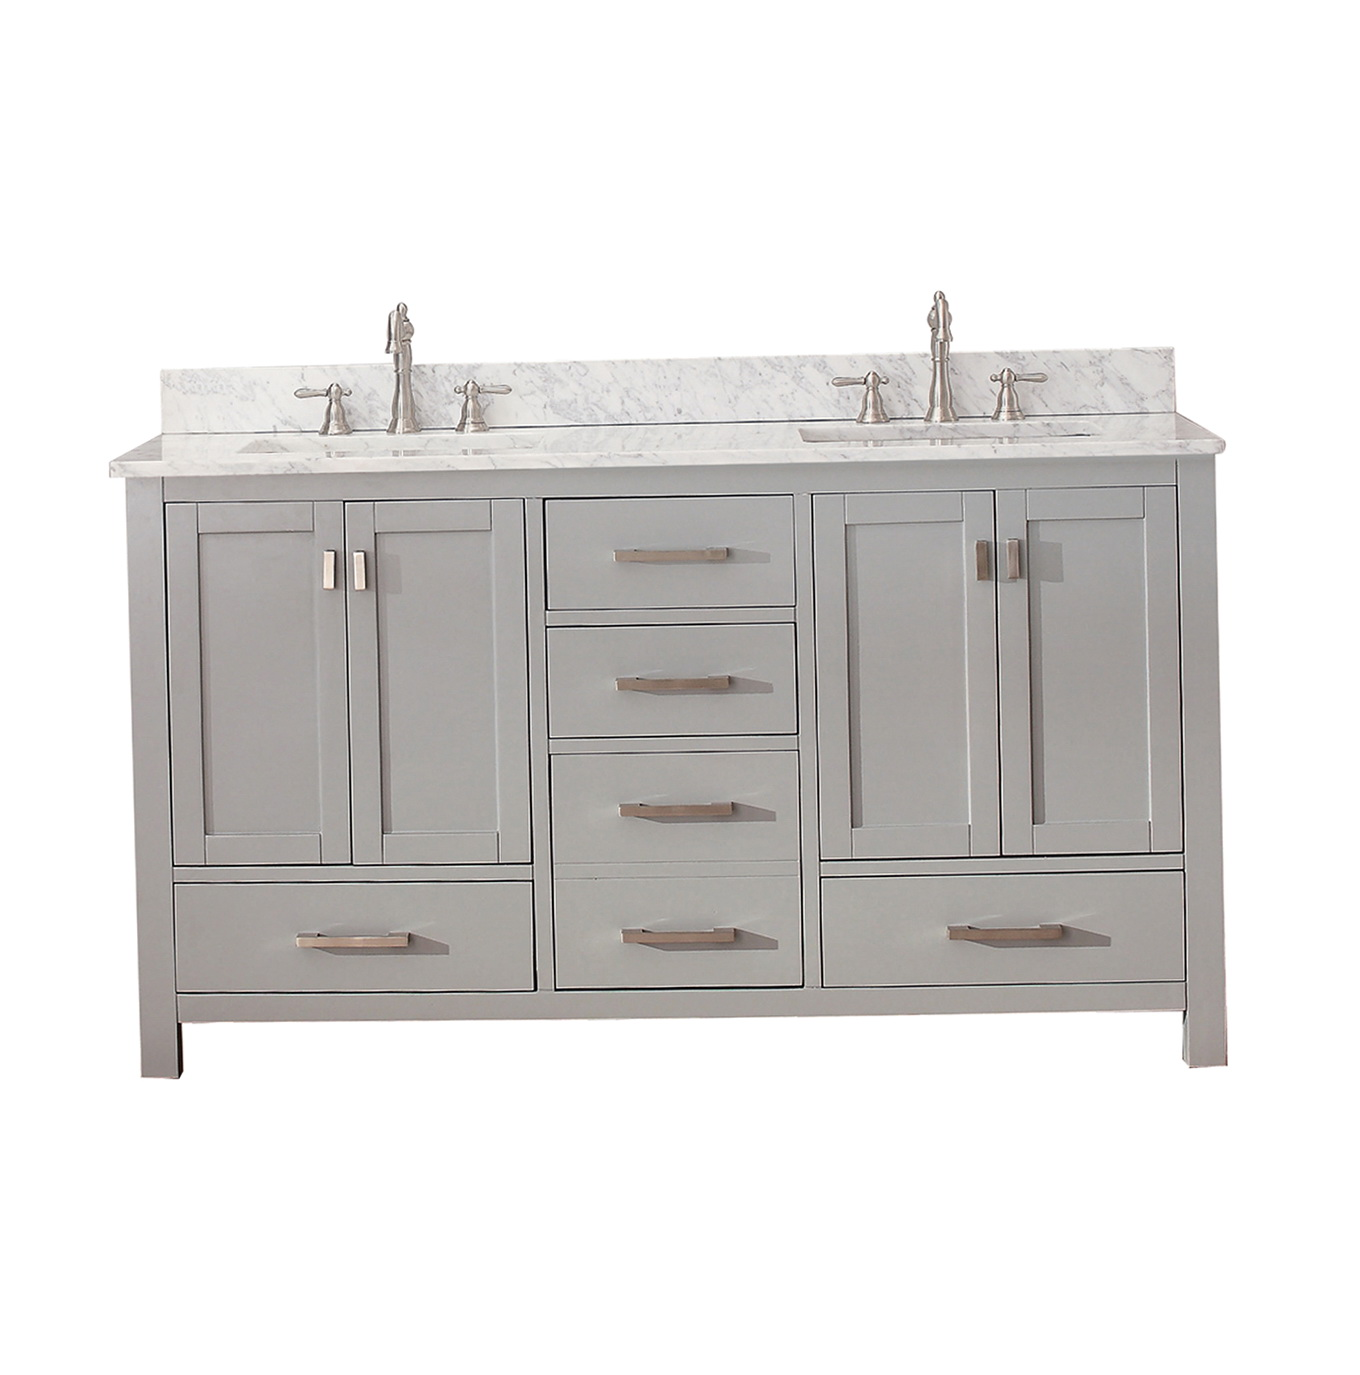 Lowes Bathroom Vanities Double Sink